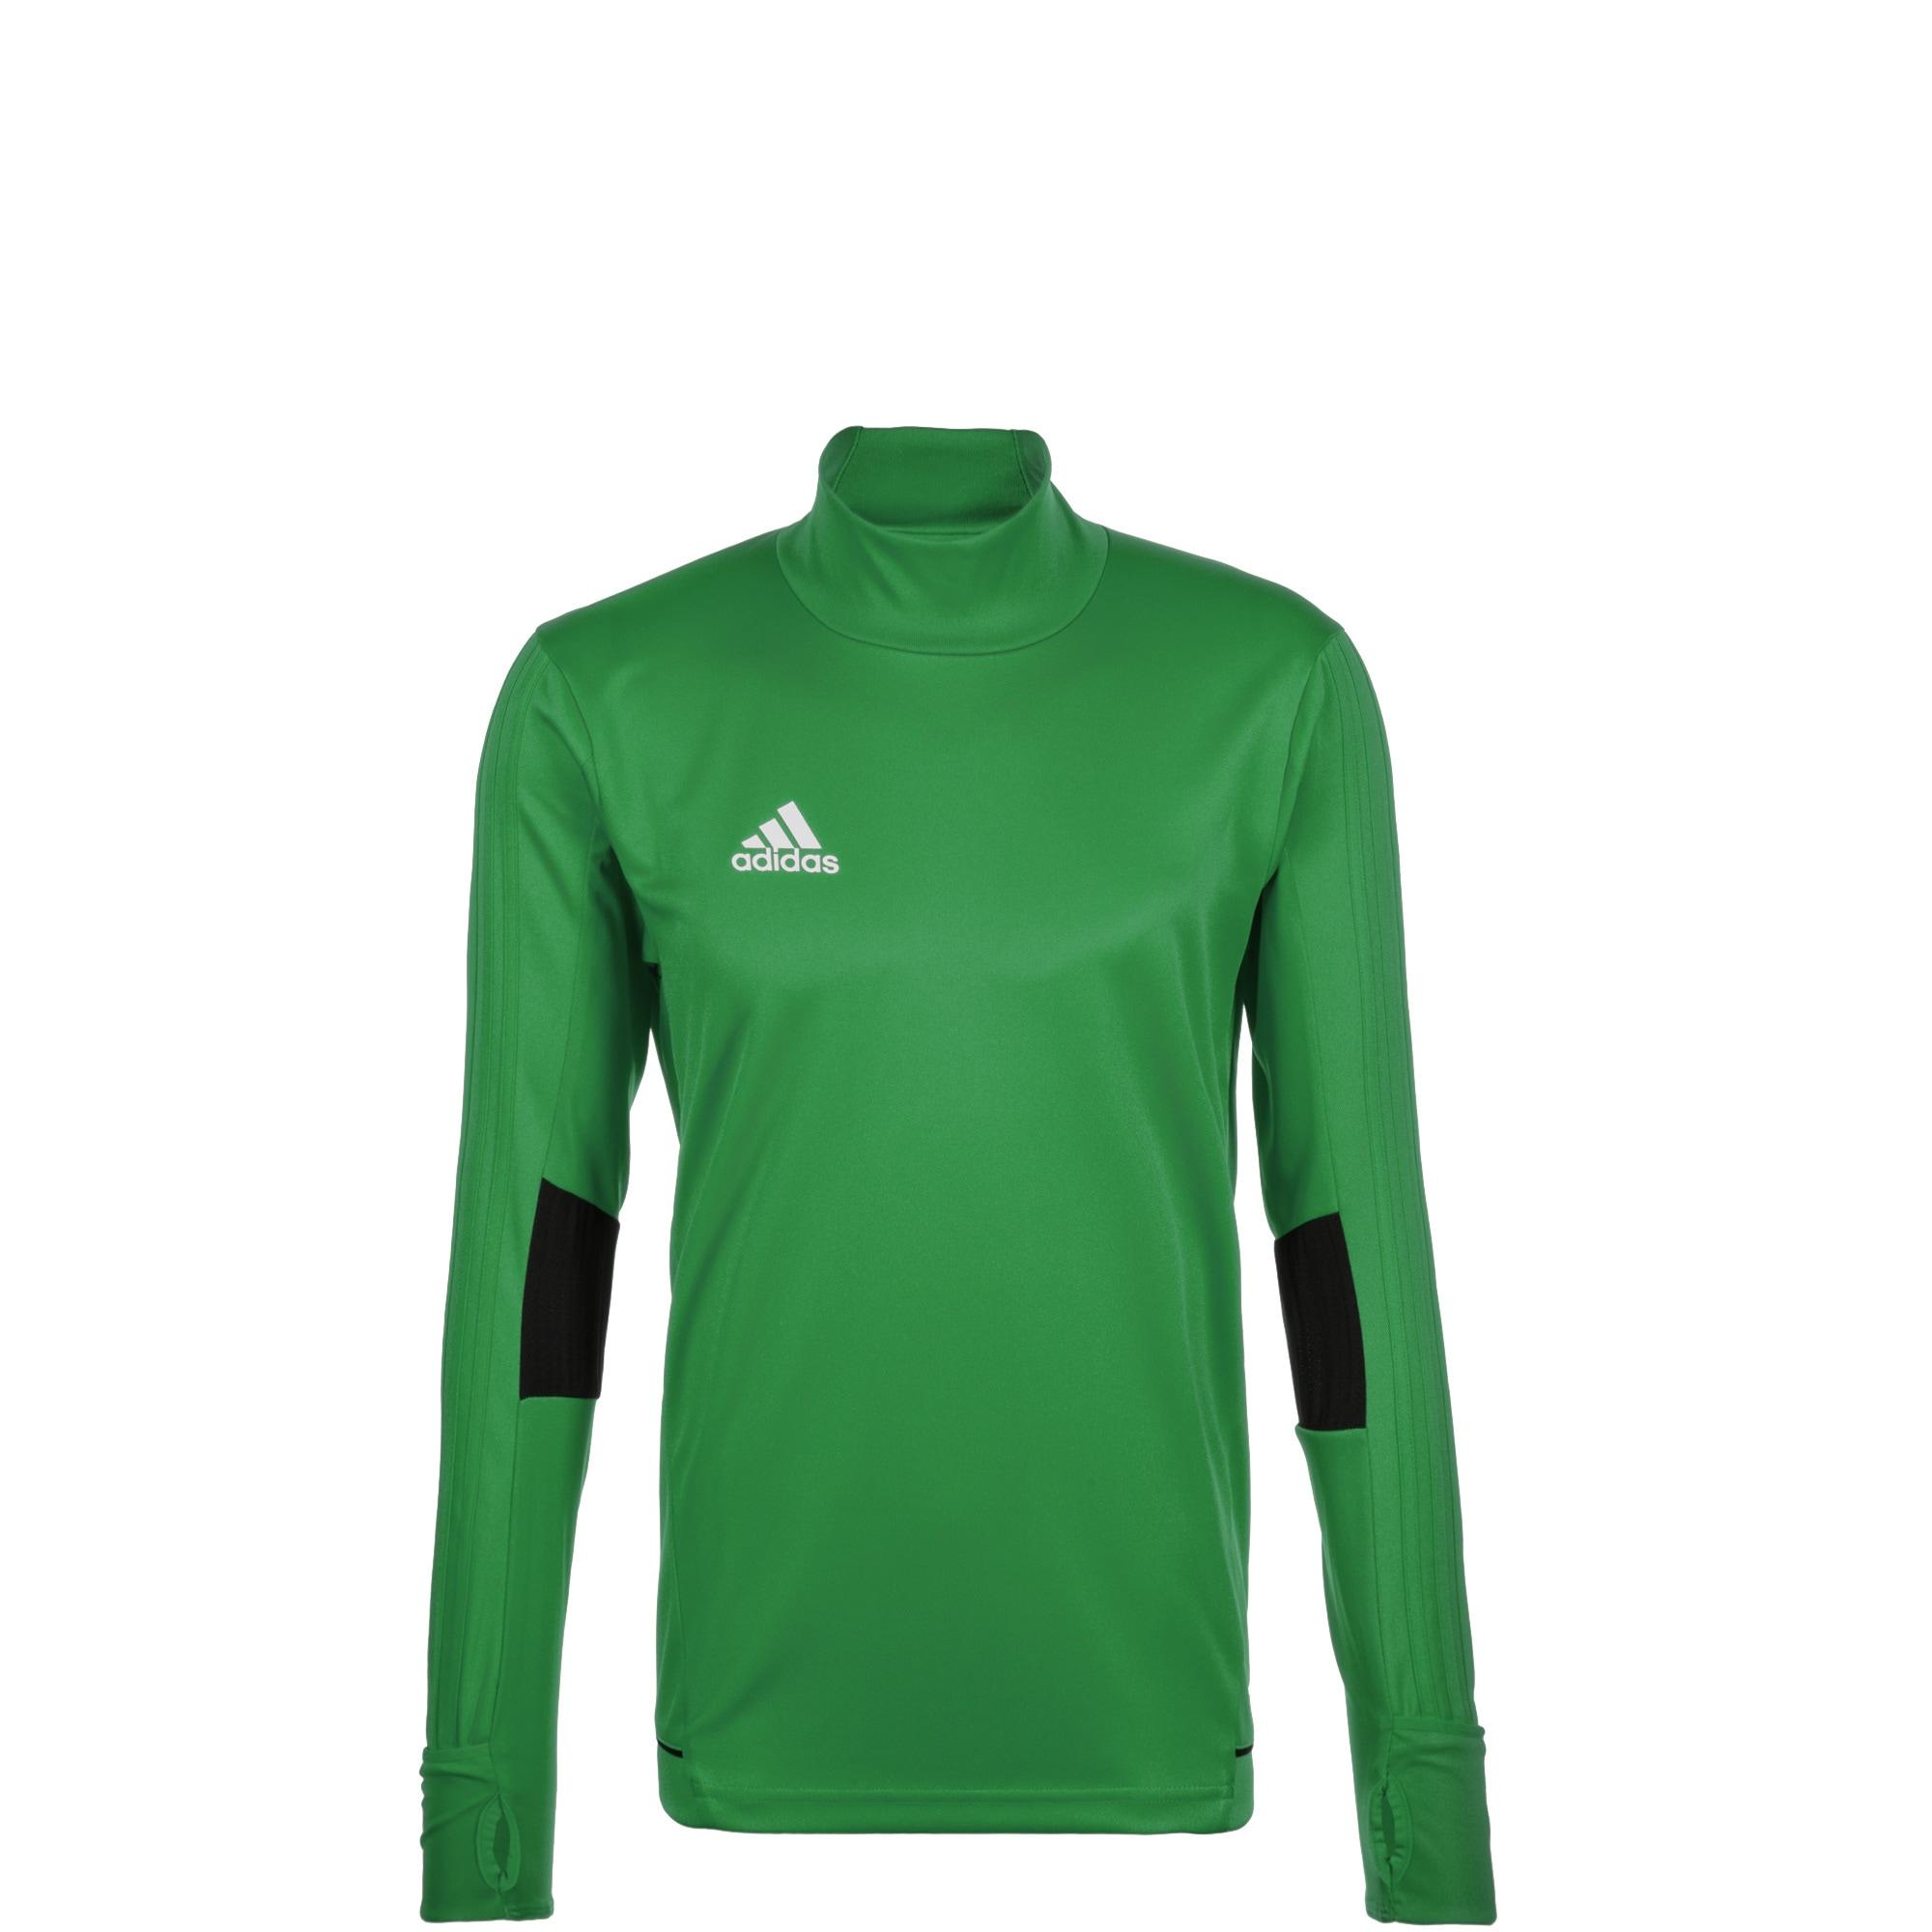 adidas Performance Longsleeve Tiro 17 grün Kinder Langarm Shirts Jungenkleidung